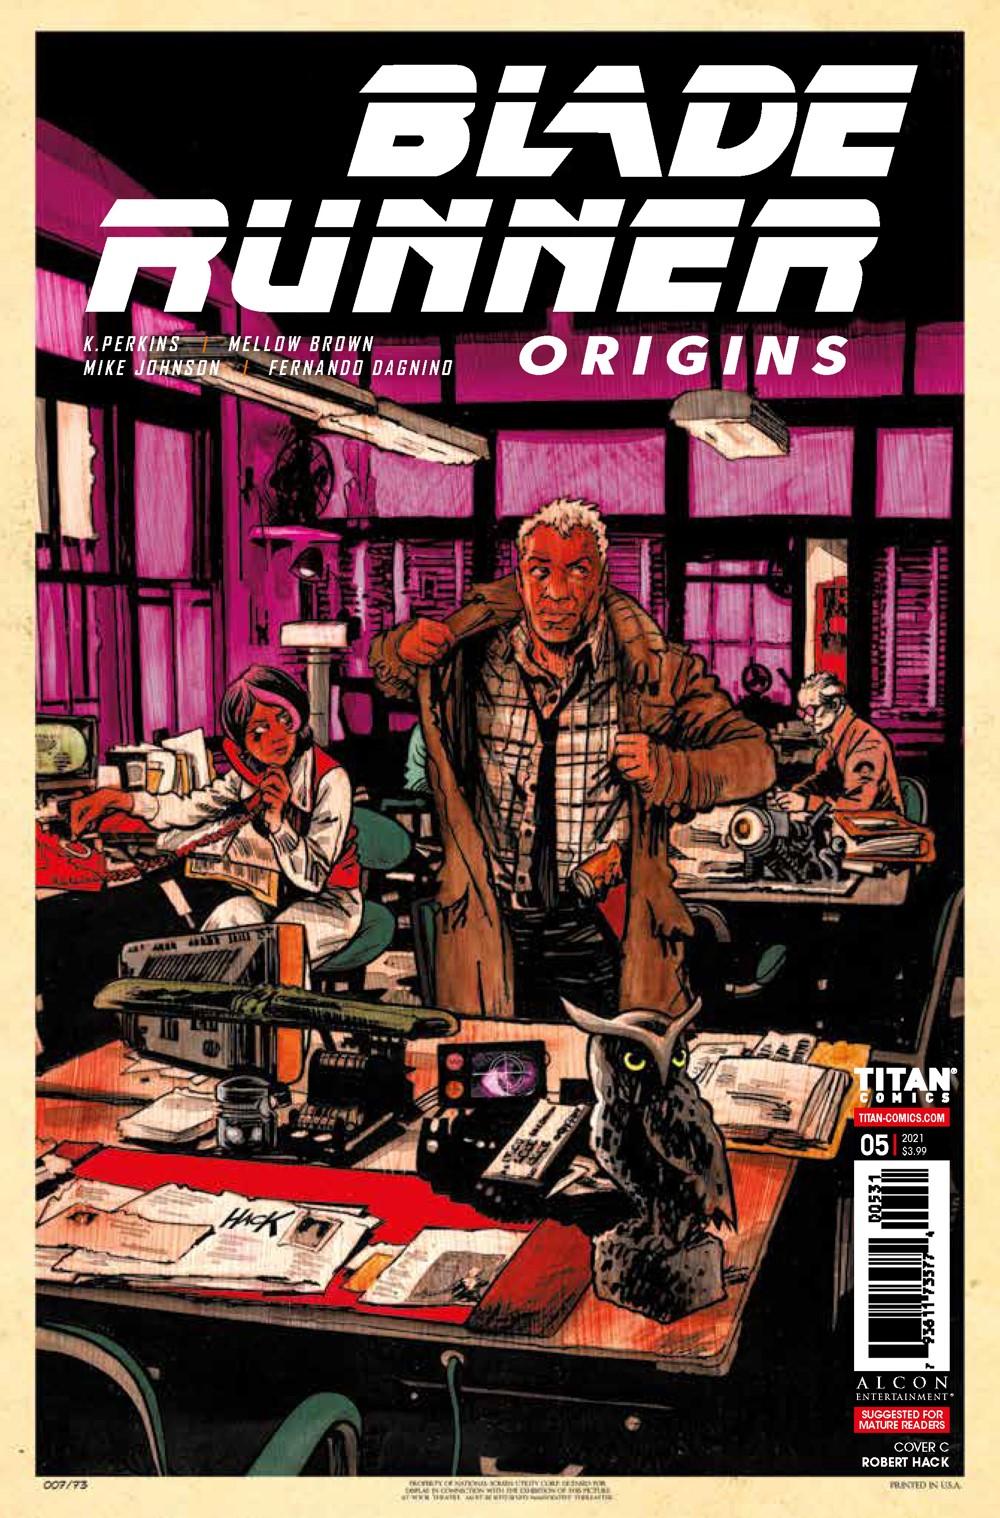 Blade_Runner_Origins_5_COVERS_C ComicList: Titan Comics New Releases for 08/18/2021